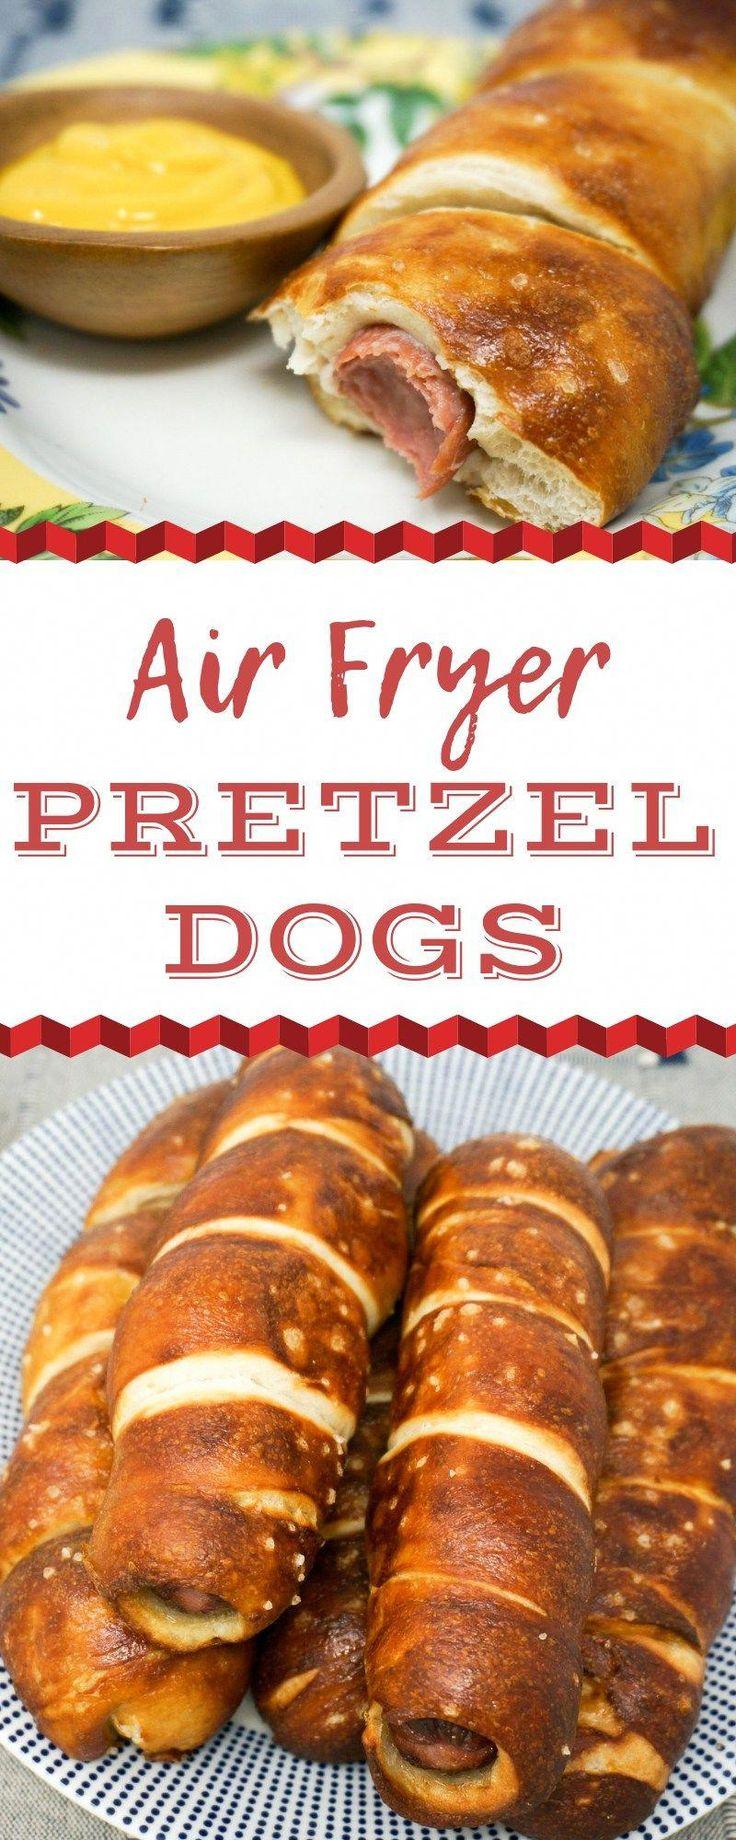 Air Fryer Pretzel Dogs Recipe Air fryer recipes